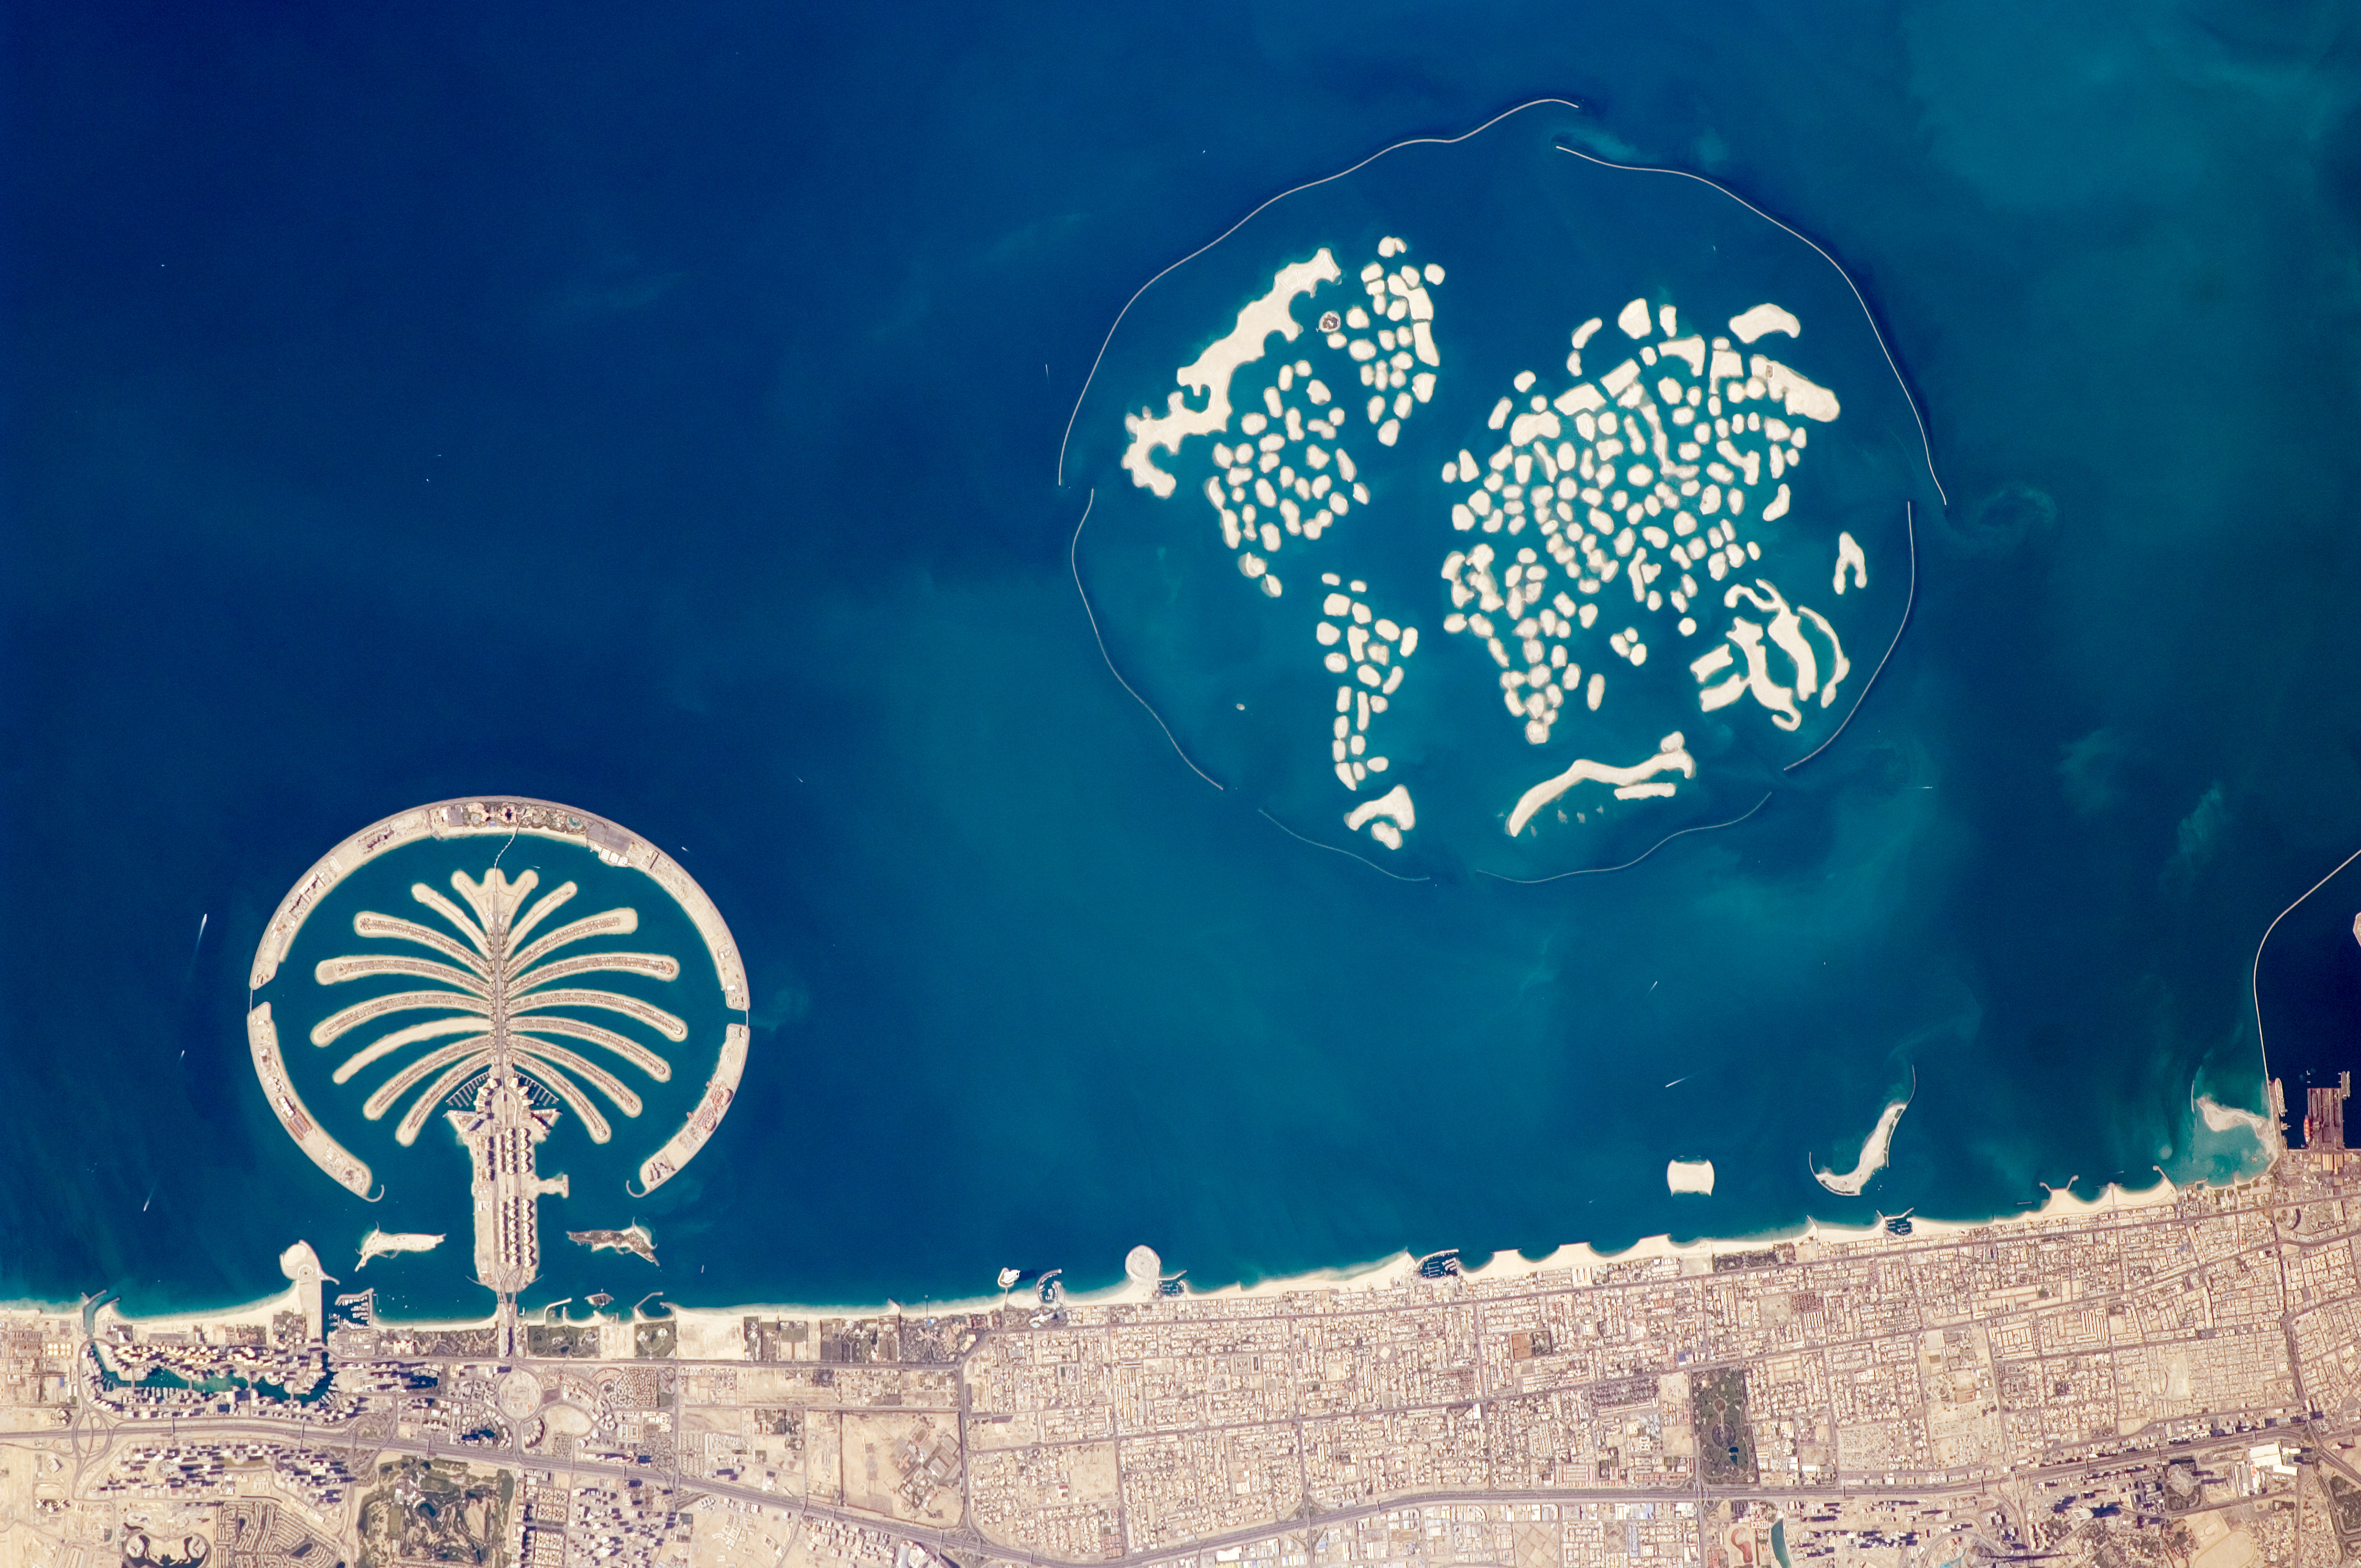 Artificial_Archipelagos,_Dubai,_United_Arab_Emirates_ISS022-E-024940_lrg.jpg